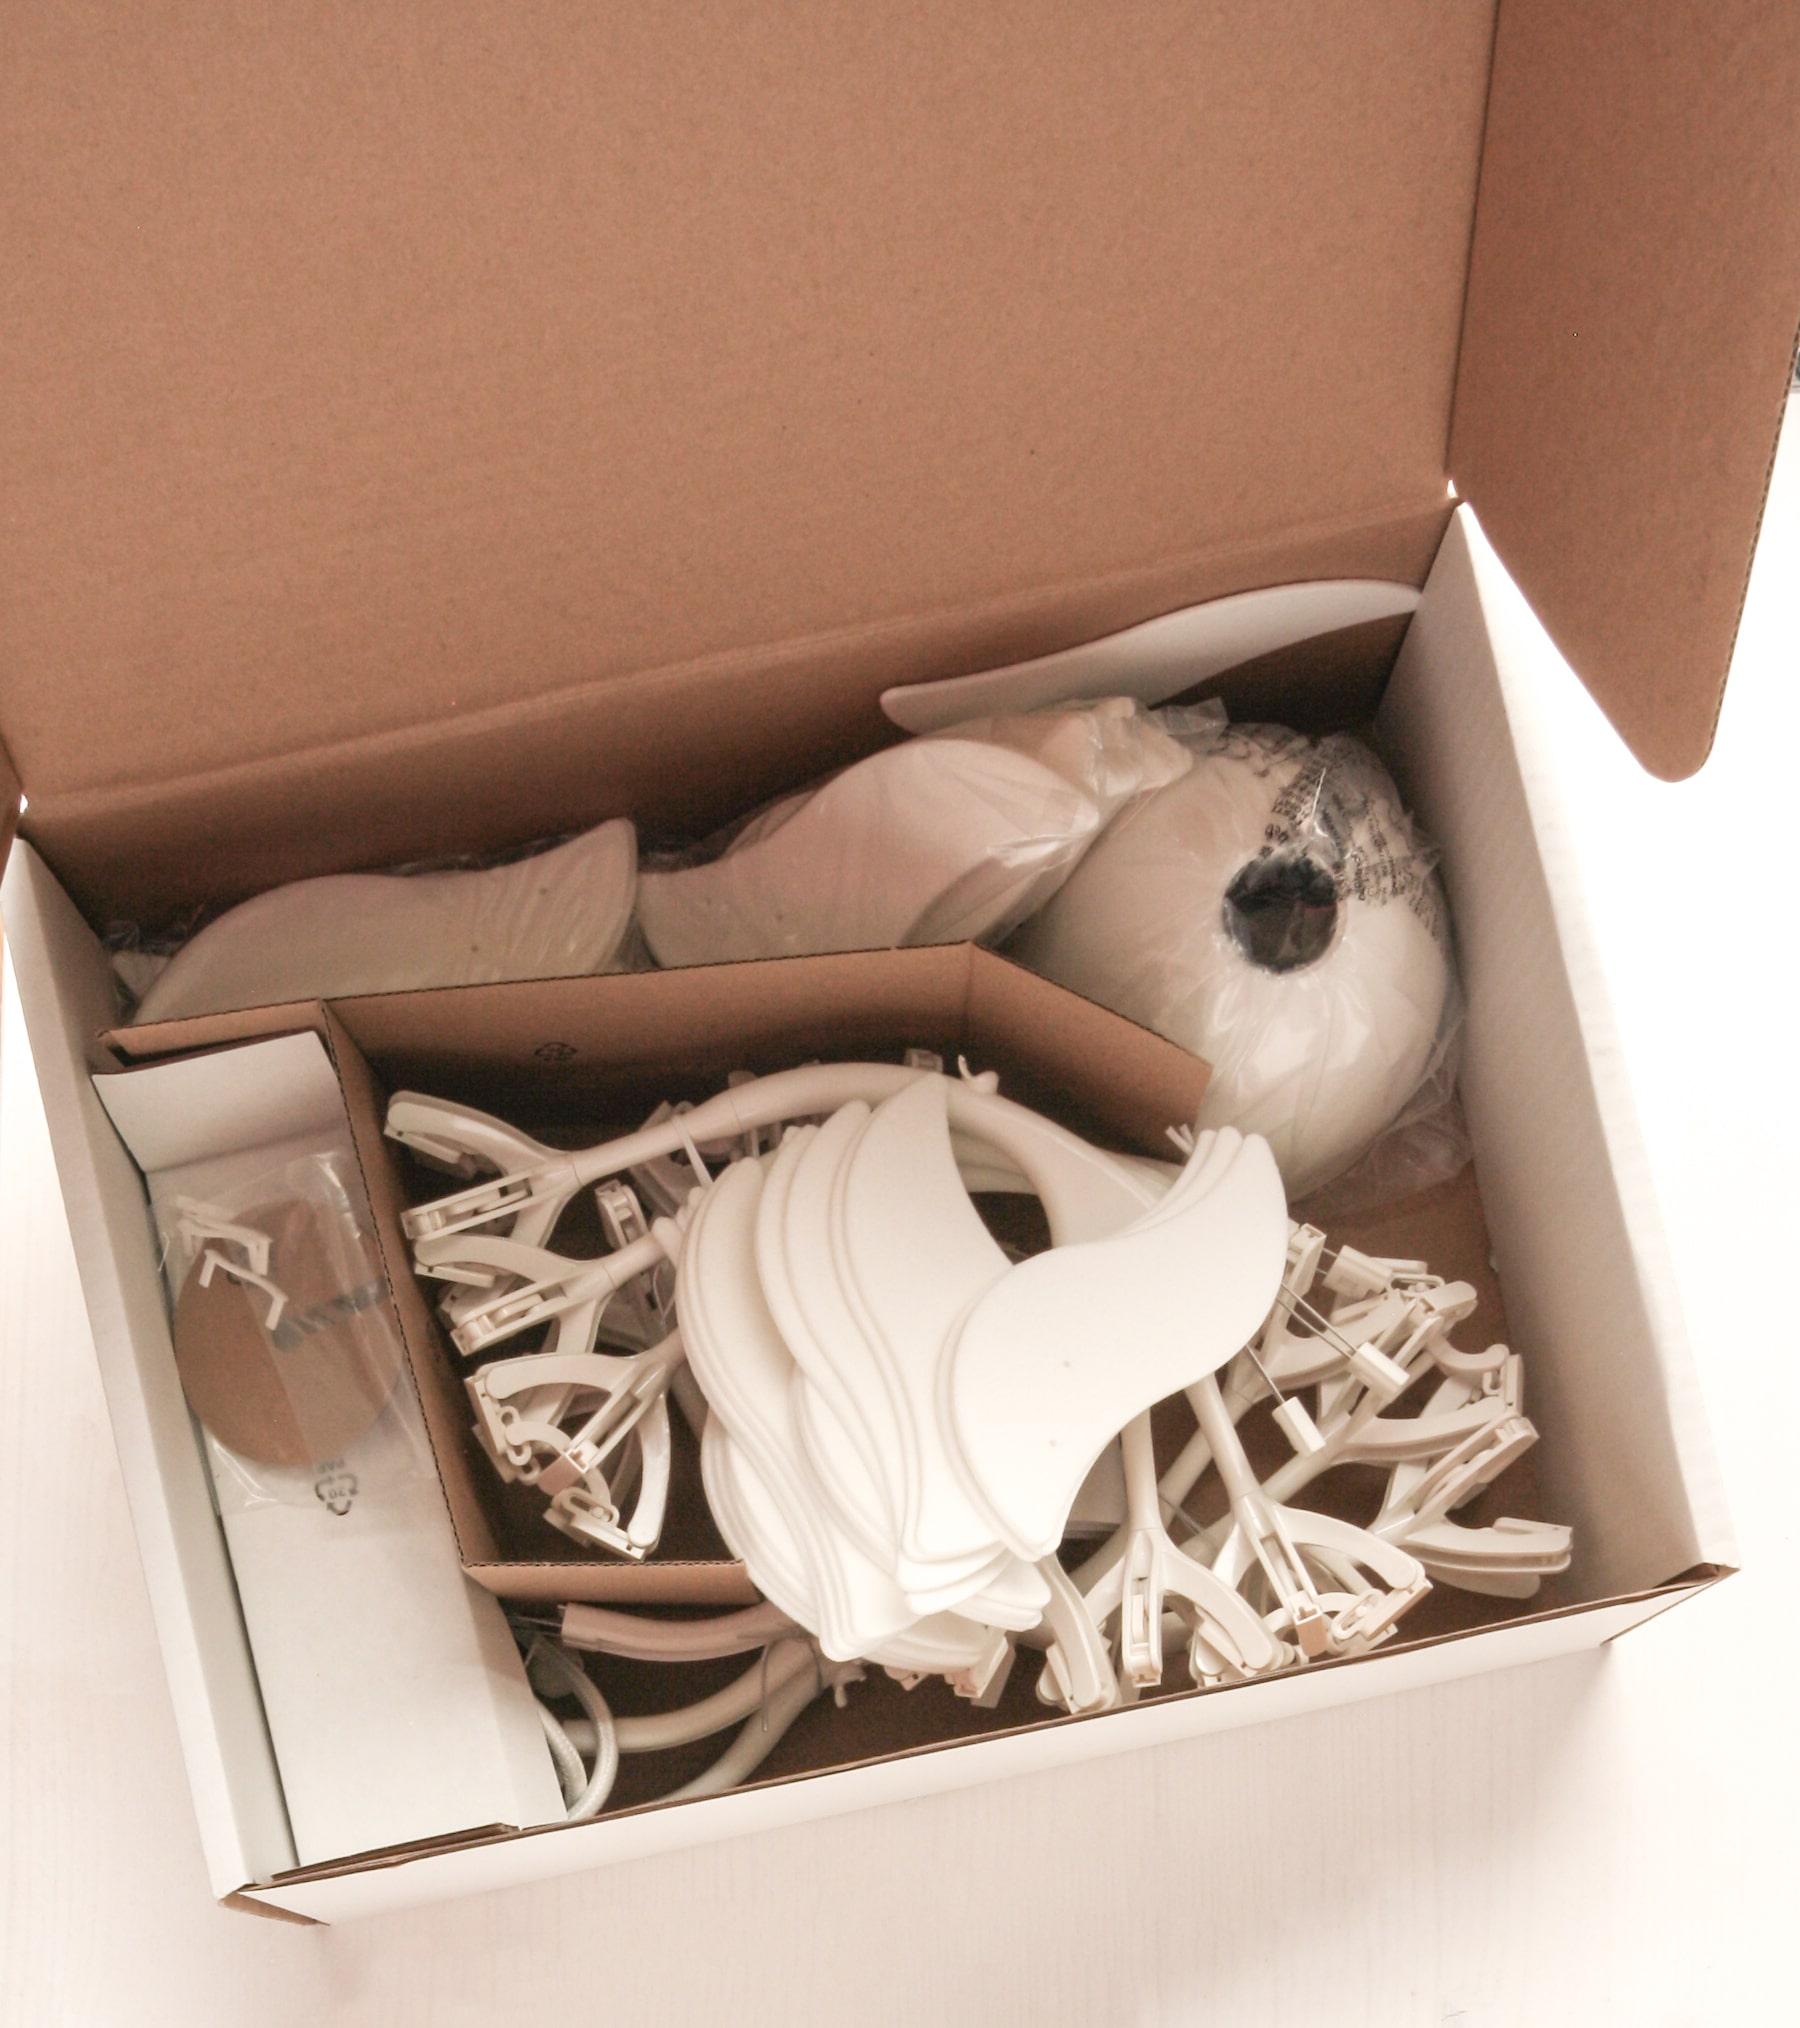 Ikea Lampe Ramsele DIY Idee